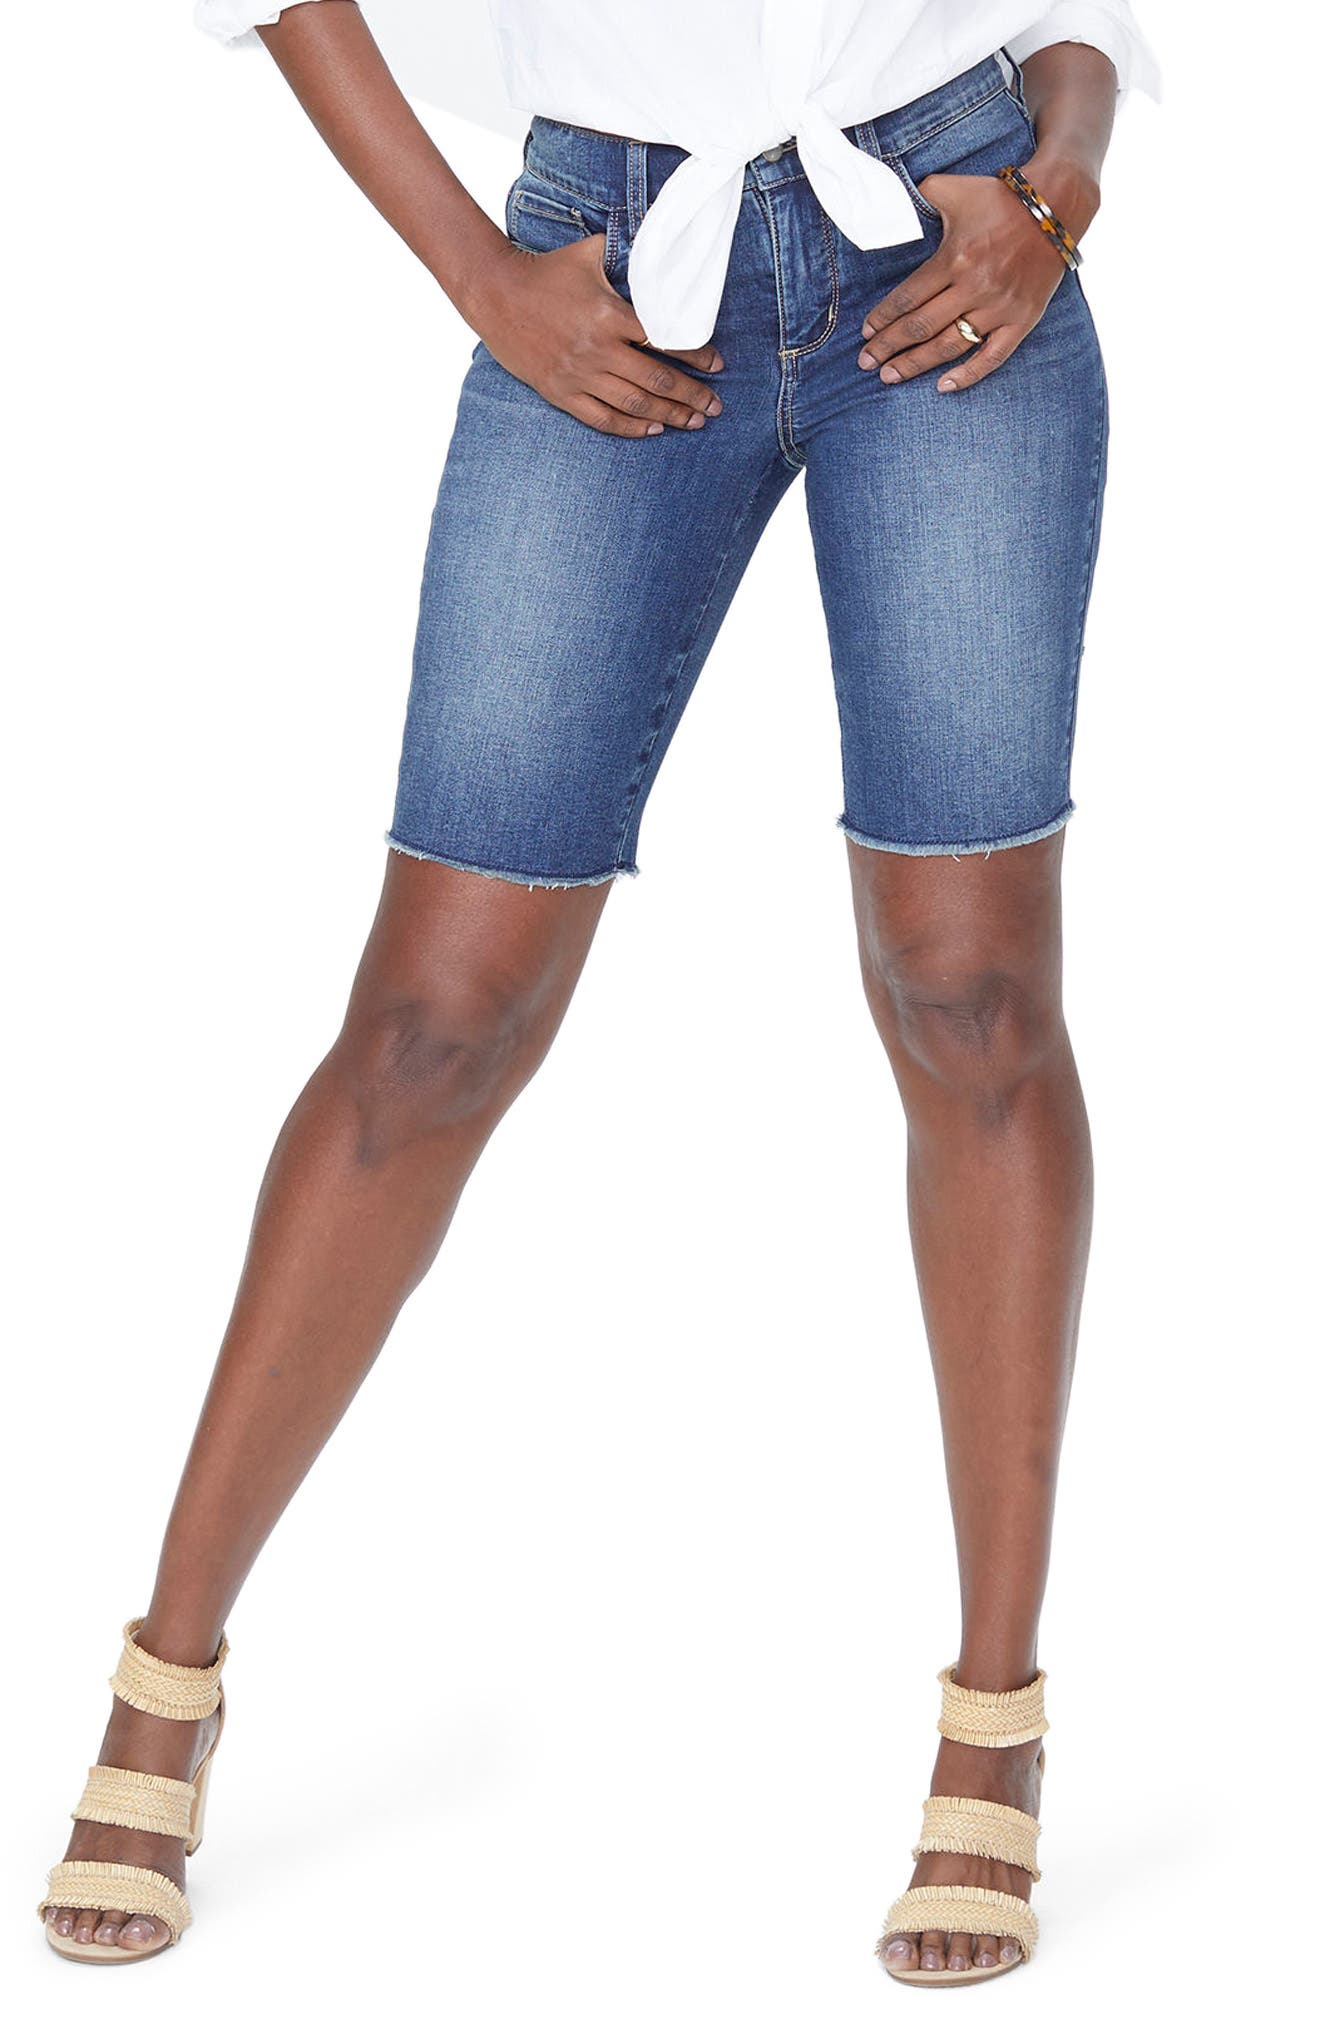 Alternate Image 1 Selected - NYDJ Briella Frayed Hem Denim Bermuda Shorts